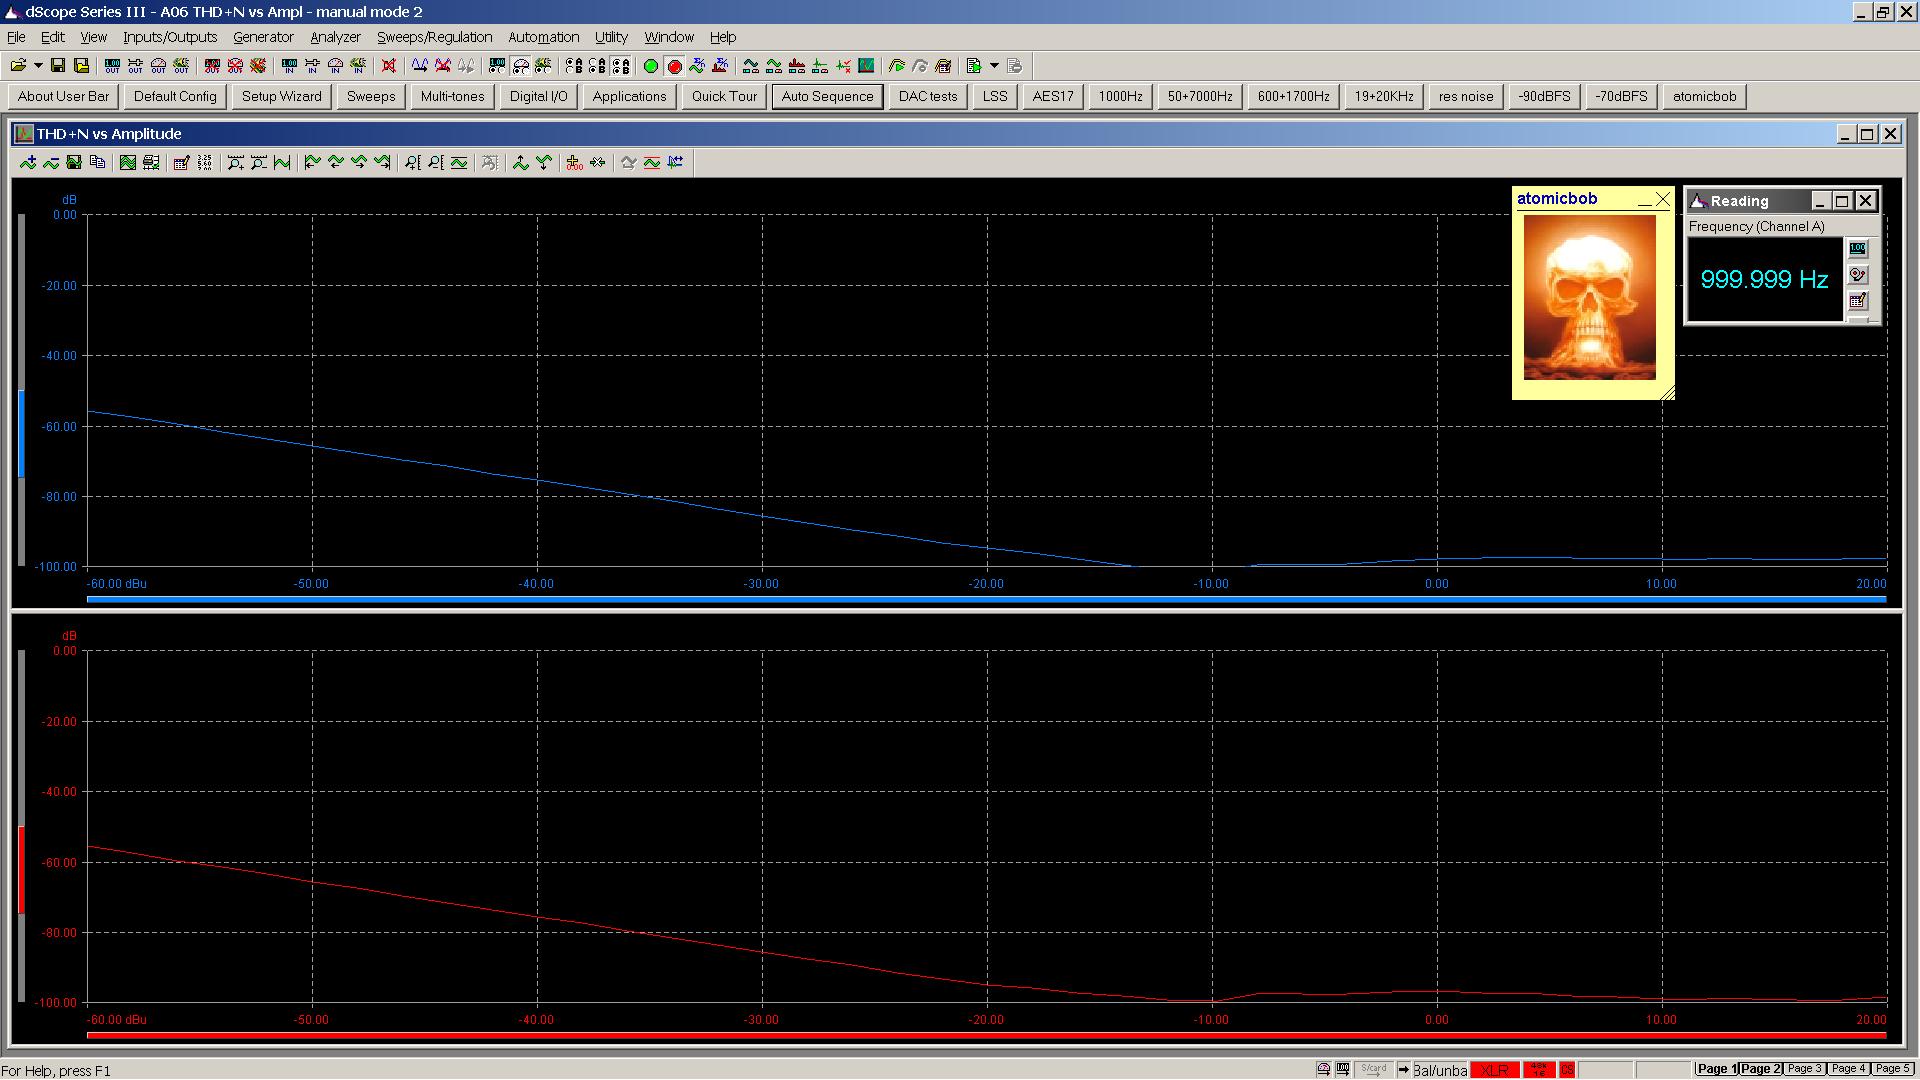 20181030 ISO Twin 1000 Hz THD+N vs Amplitude 100K - v2.png